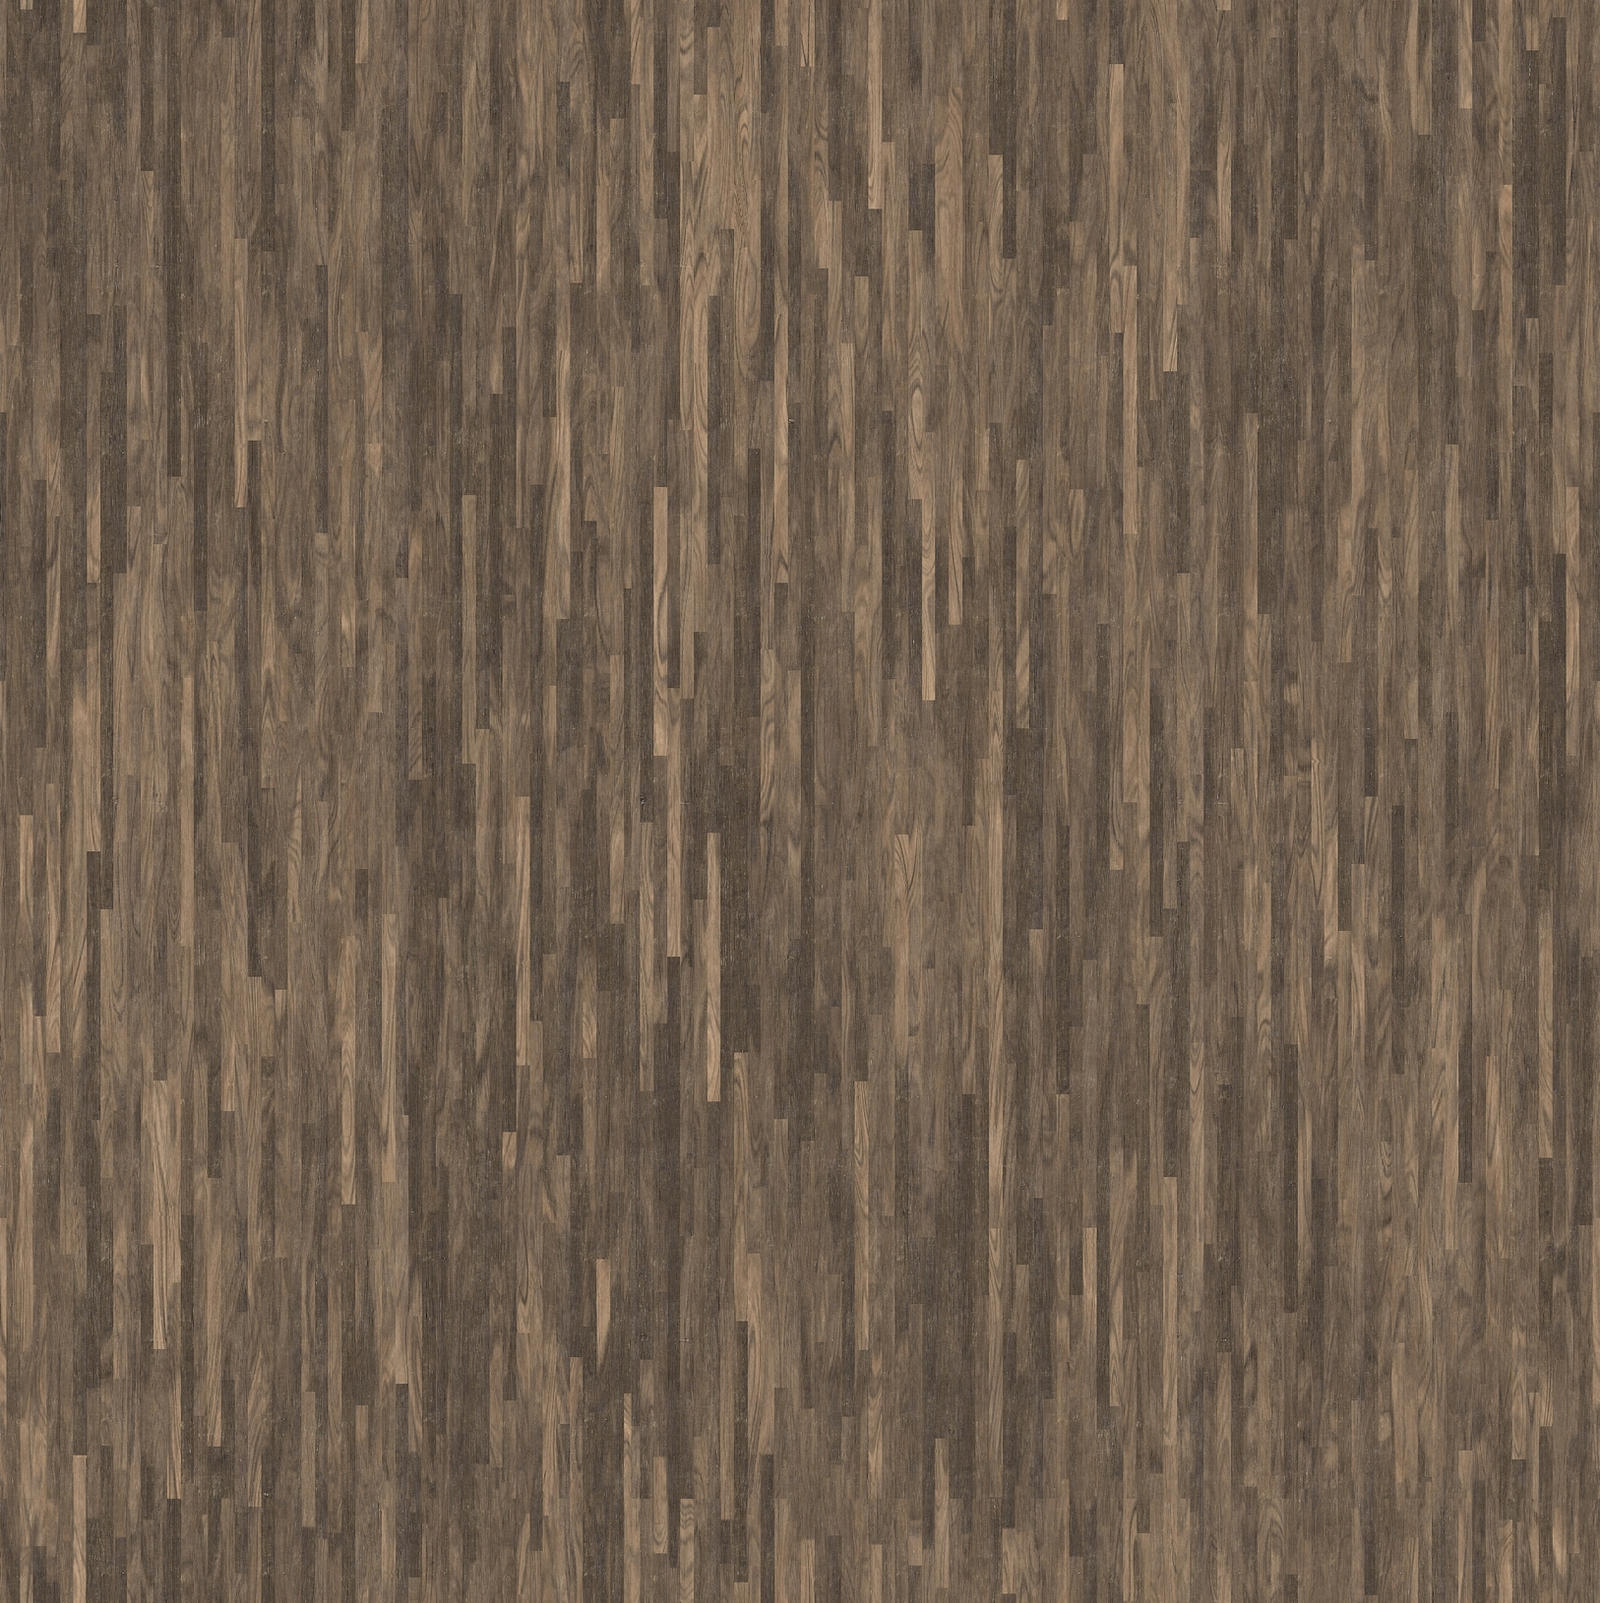 Door Wood Texture Seamless : Wood Floor - Seamless by AGF81 on DeviantArt